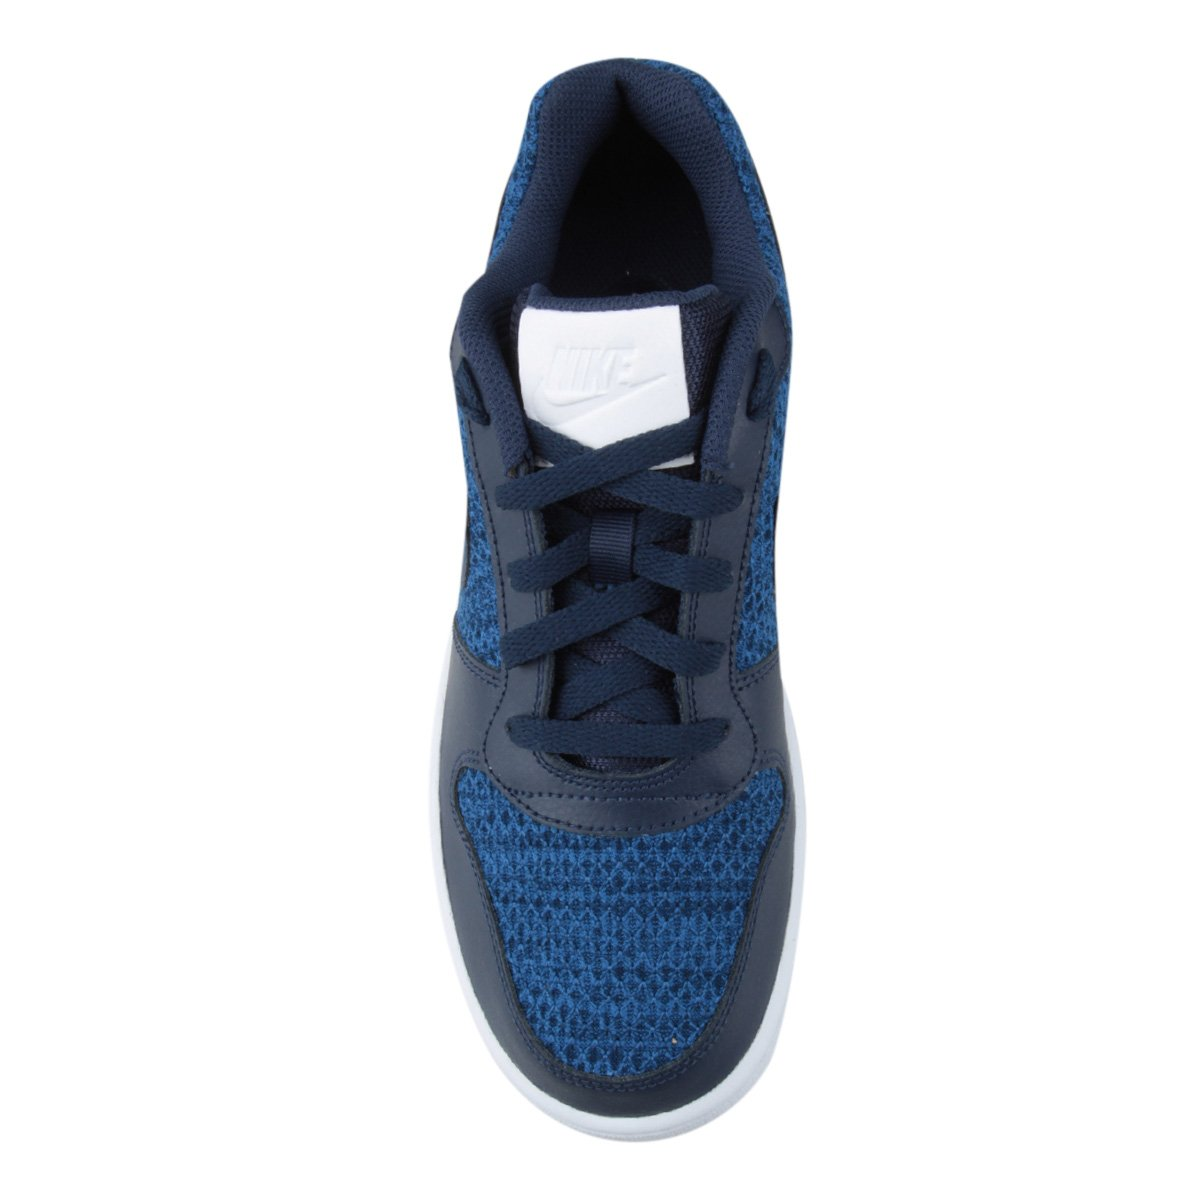 Marinho Ebernon Tênis Prem Ebernon Tênis Masculino Low Low Nike Nike wnXX1z0gq